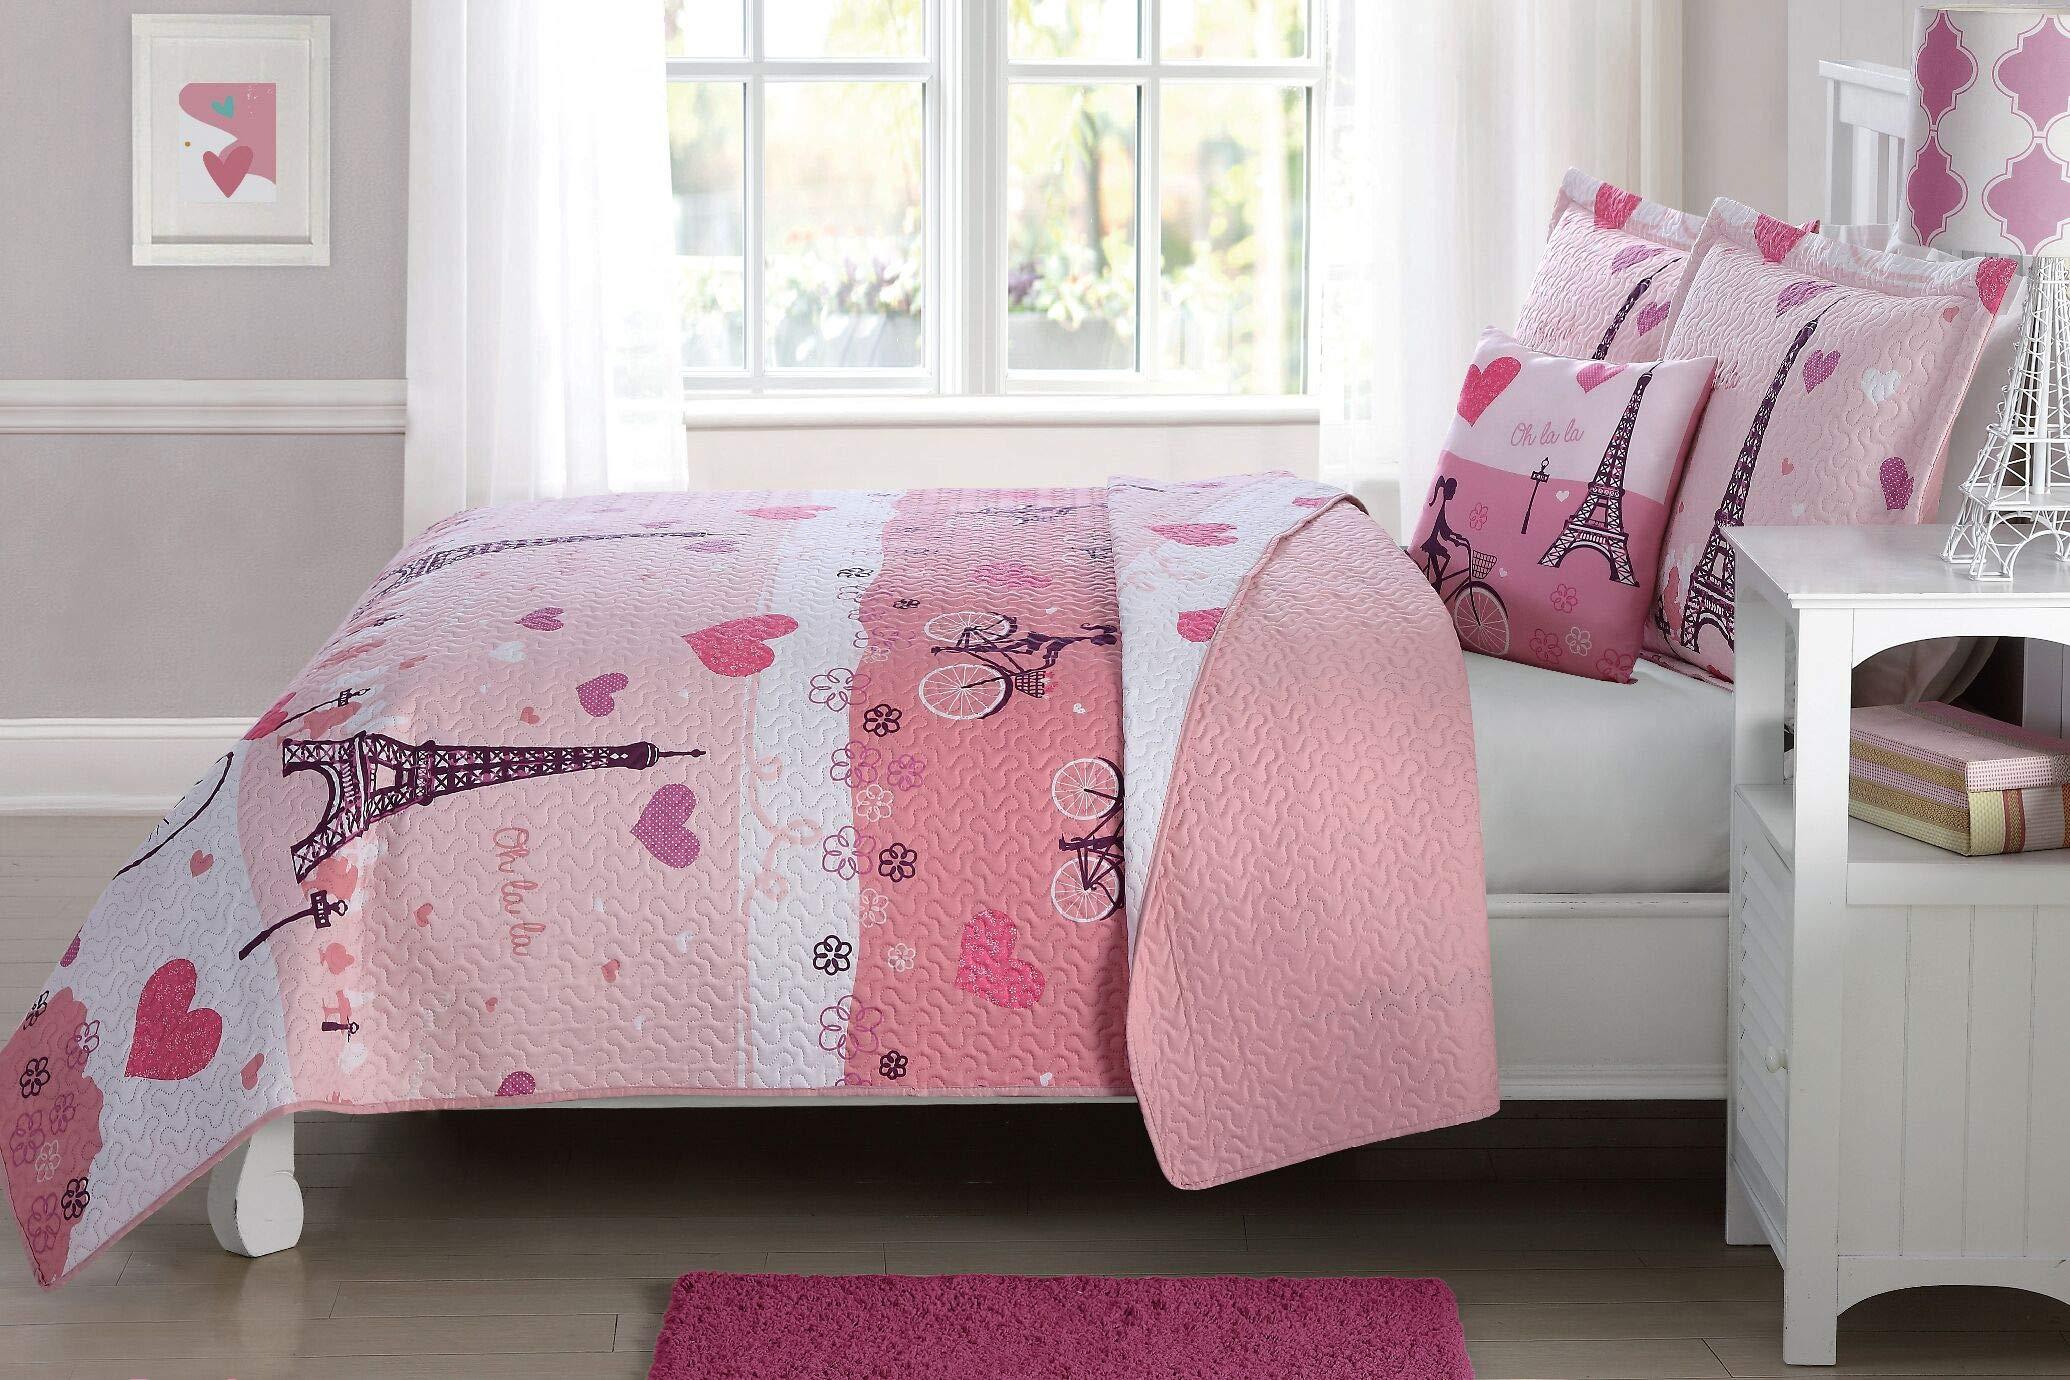 Sapphire Home 4pc Kids Teens Girls Full Bedspread Quilt Set, Pink Purple France Paris Eiffel Tower Hearts Print Design Coverlet for Girls Teens, Full Paris Quilt by Sapphire Home